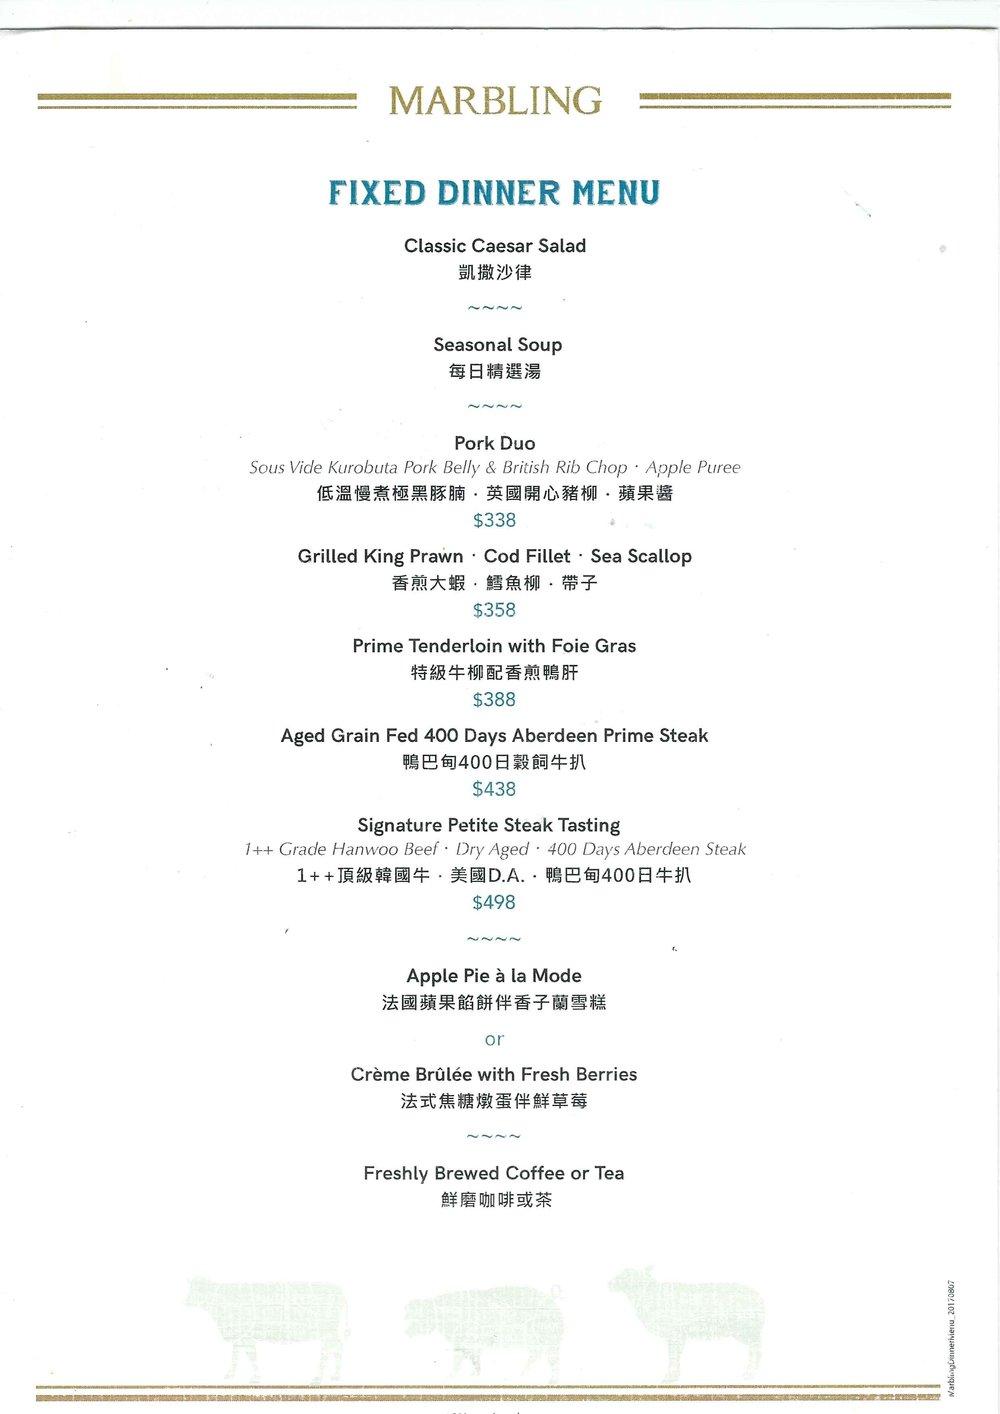 Set Dinner menu at Marbling Steakhouse in Causeway Bay, HK